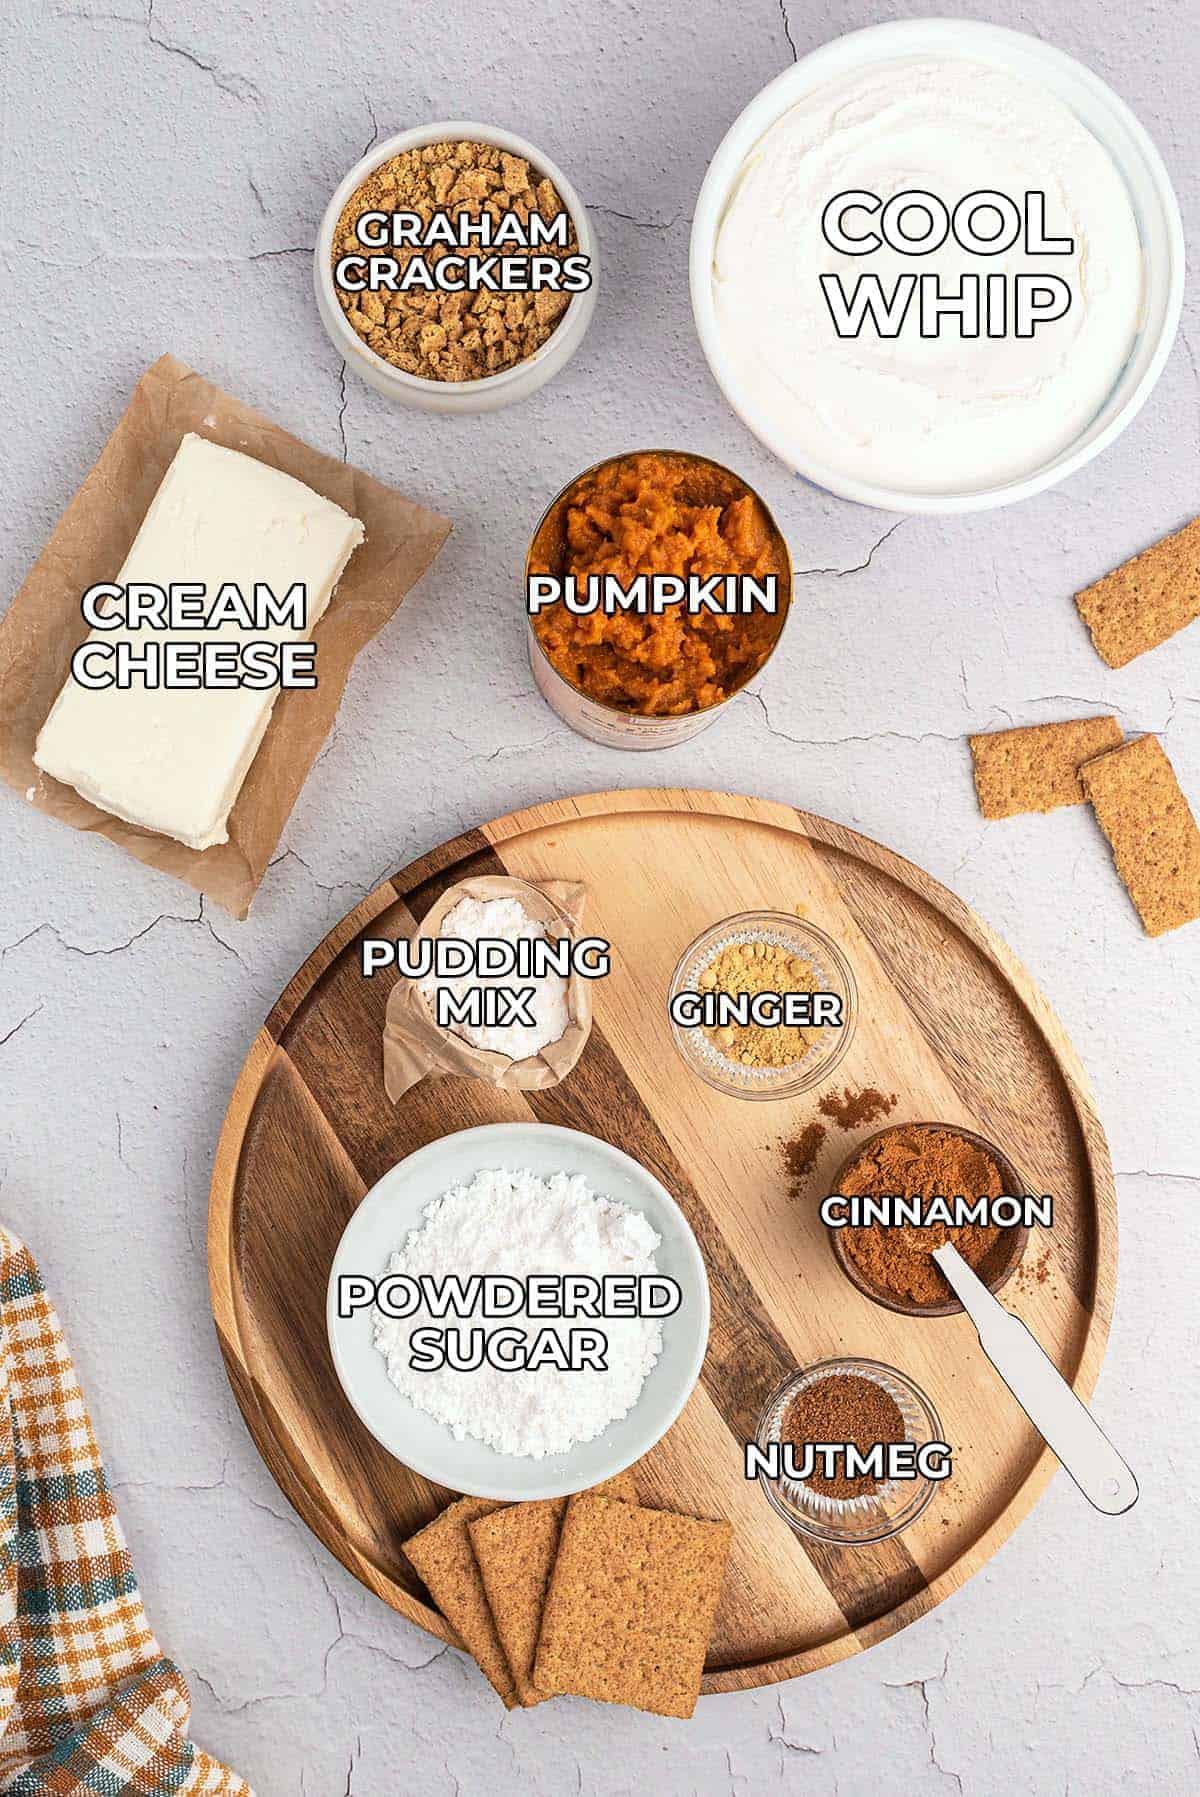 ingredients needed for pumpkin pie dip.